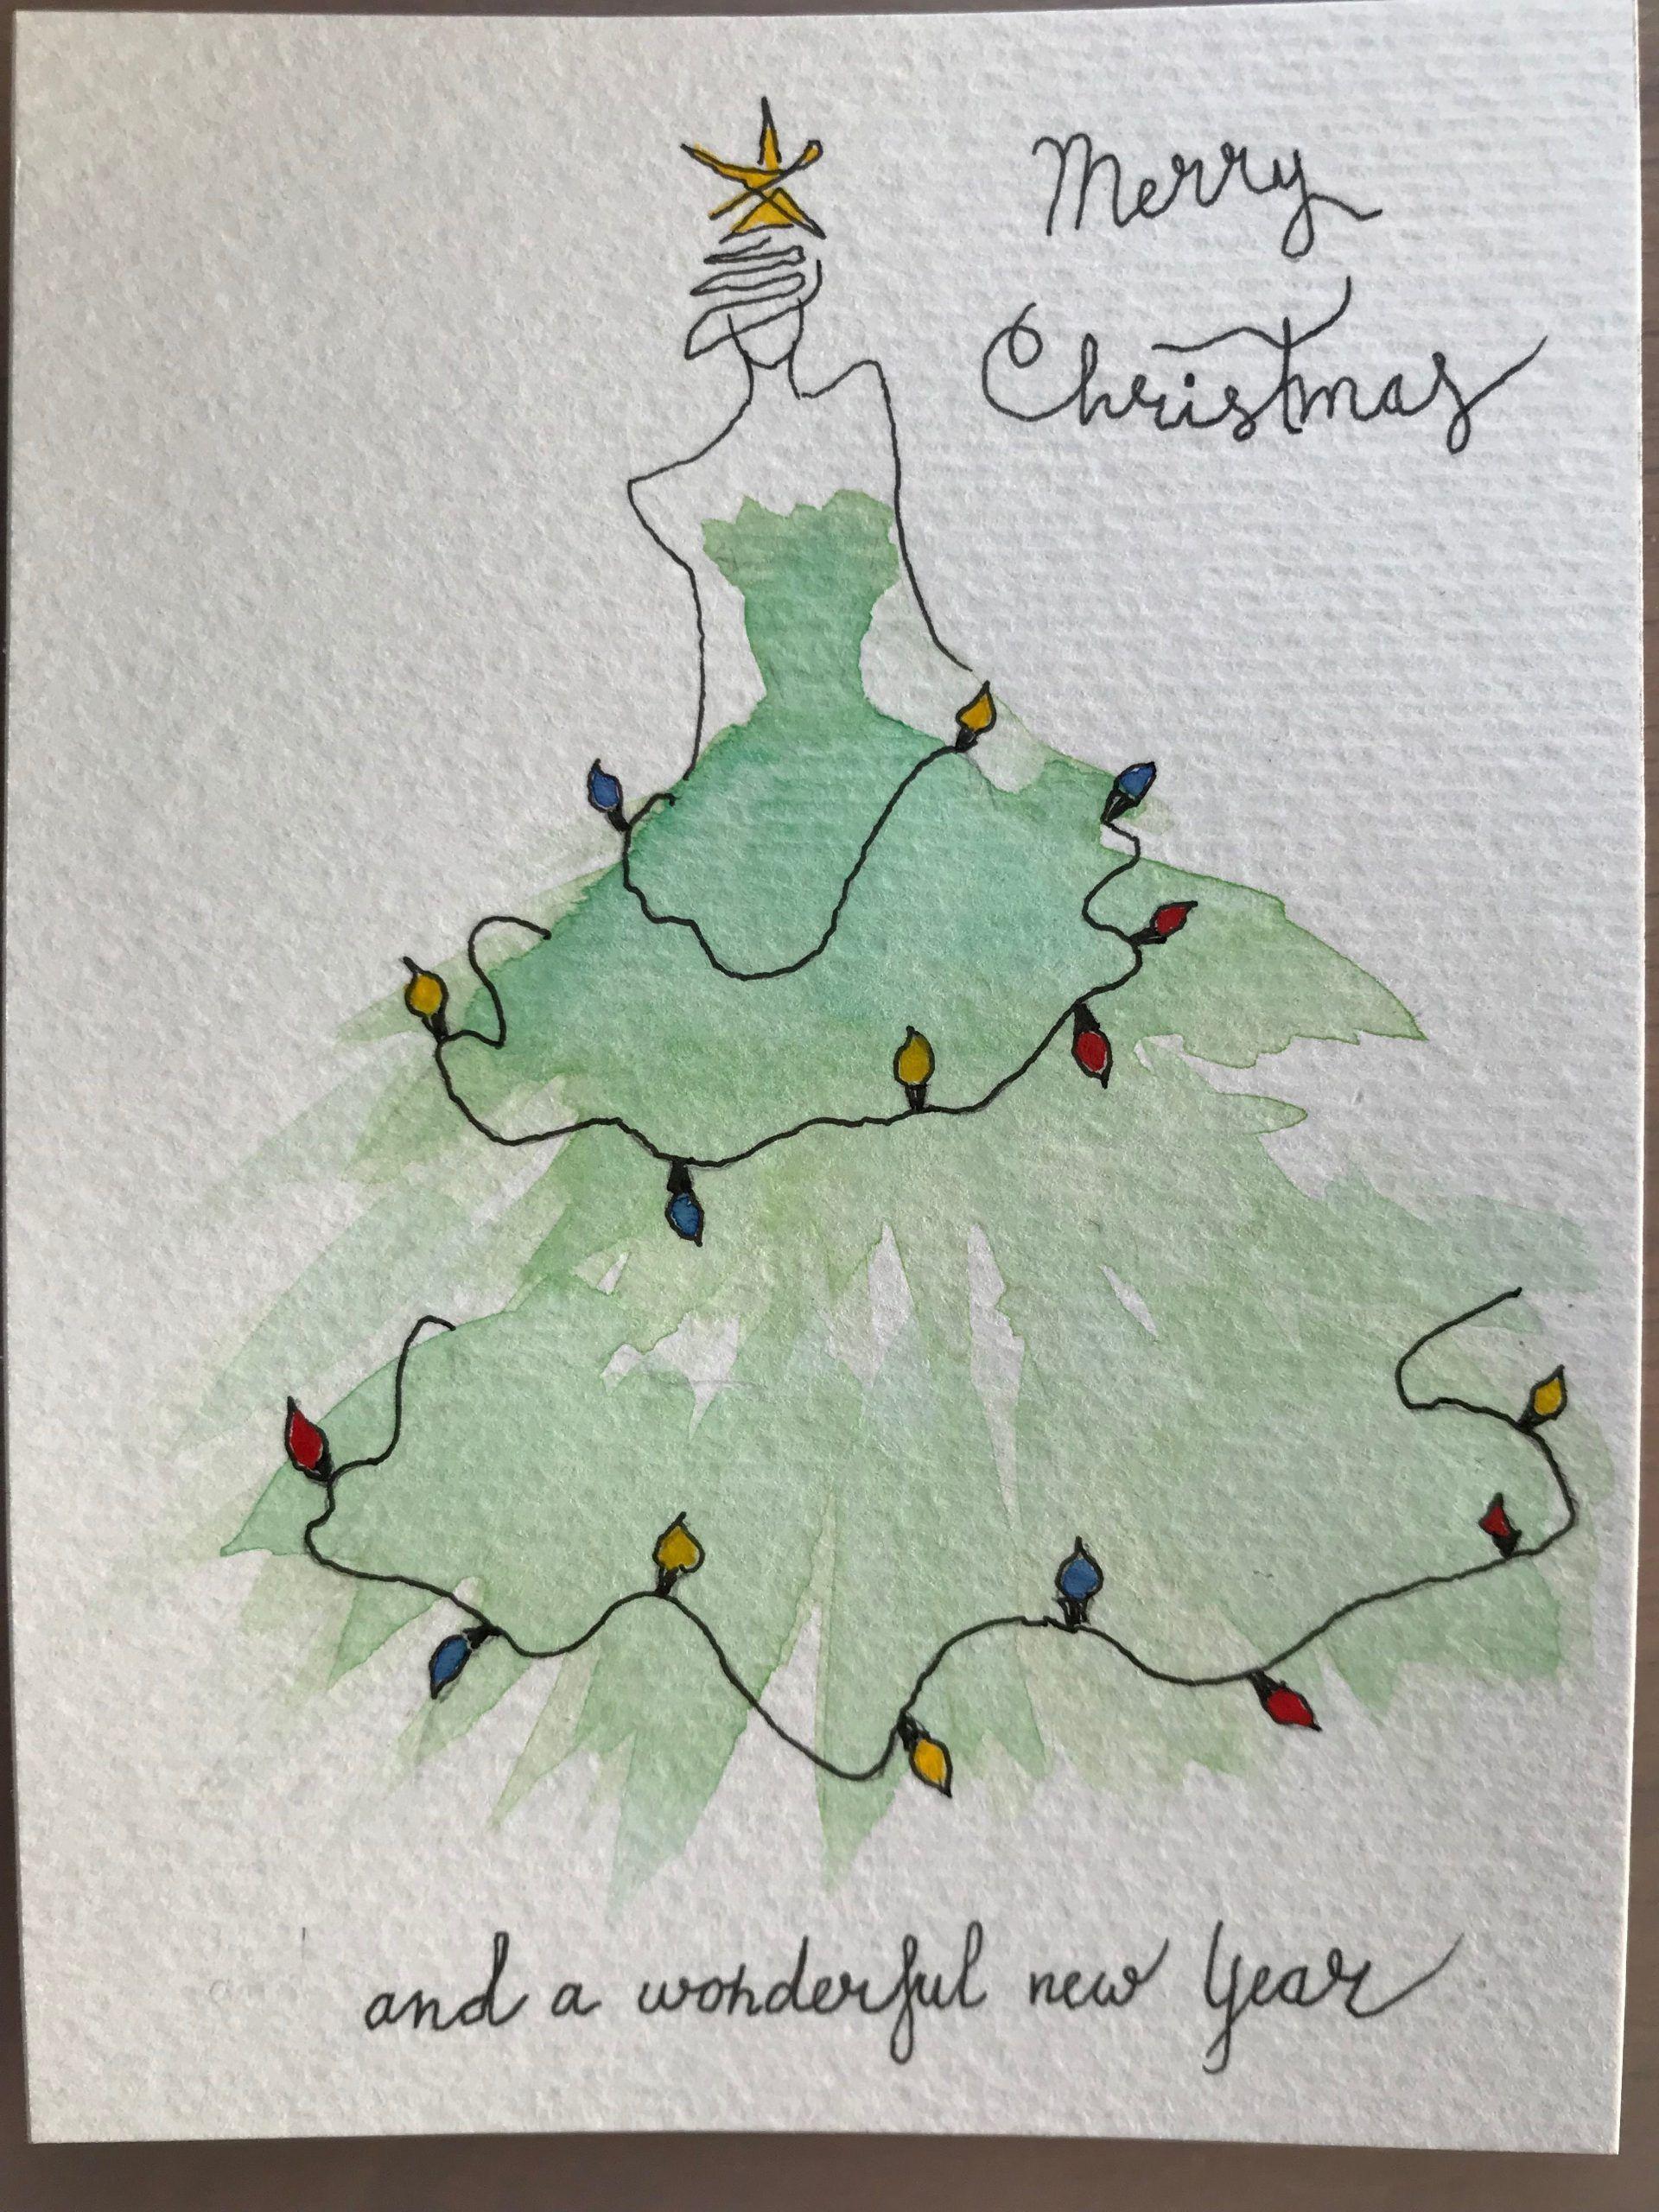 Current Christmas Cards 2020 aquarell weihnachten #weihnachten Christmas Dressing.#aquarell